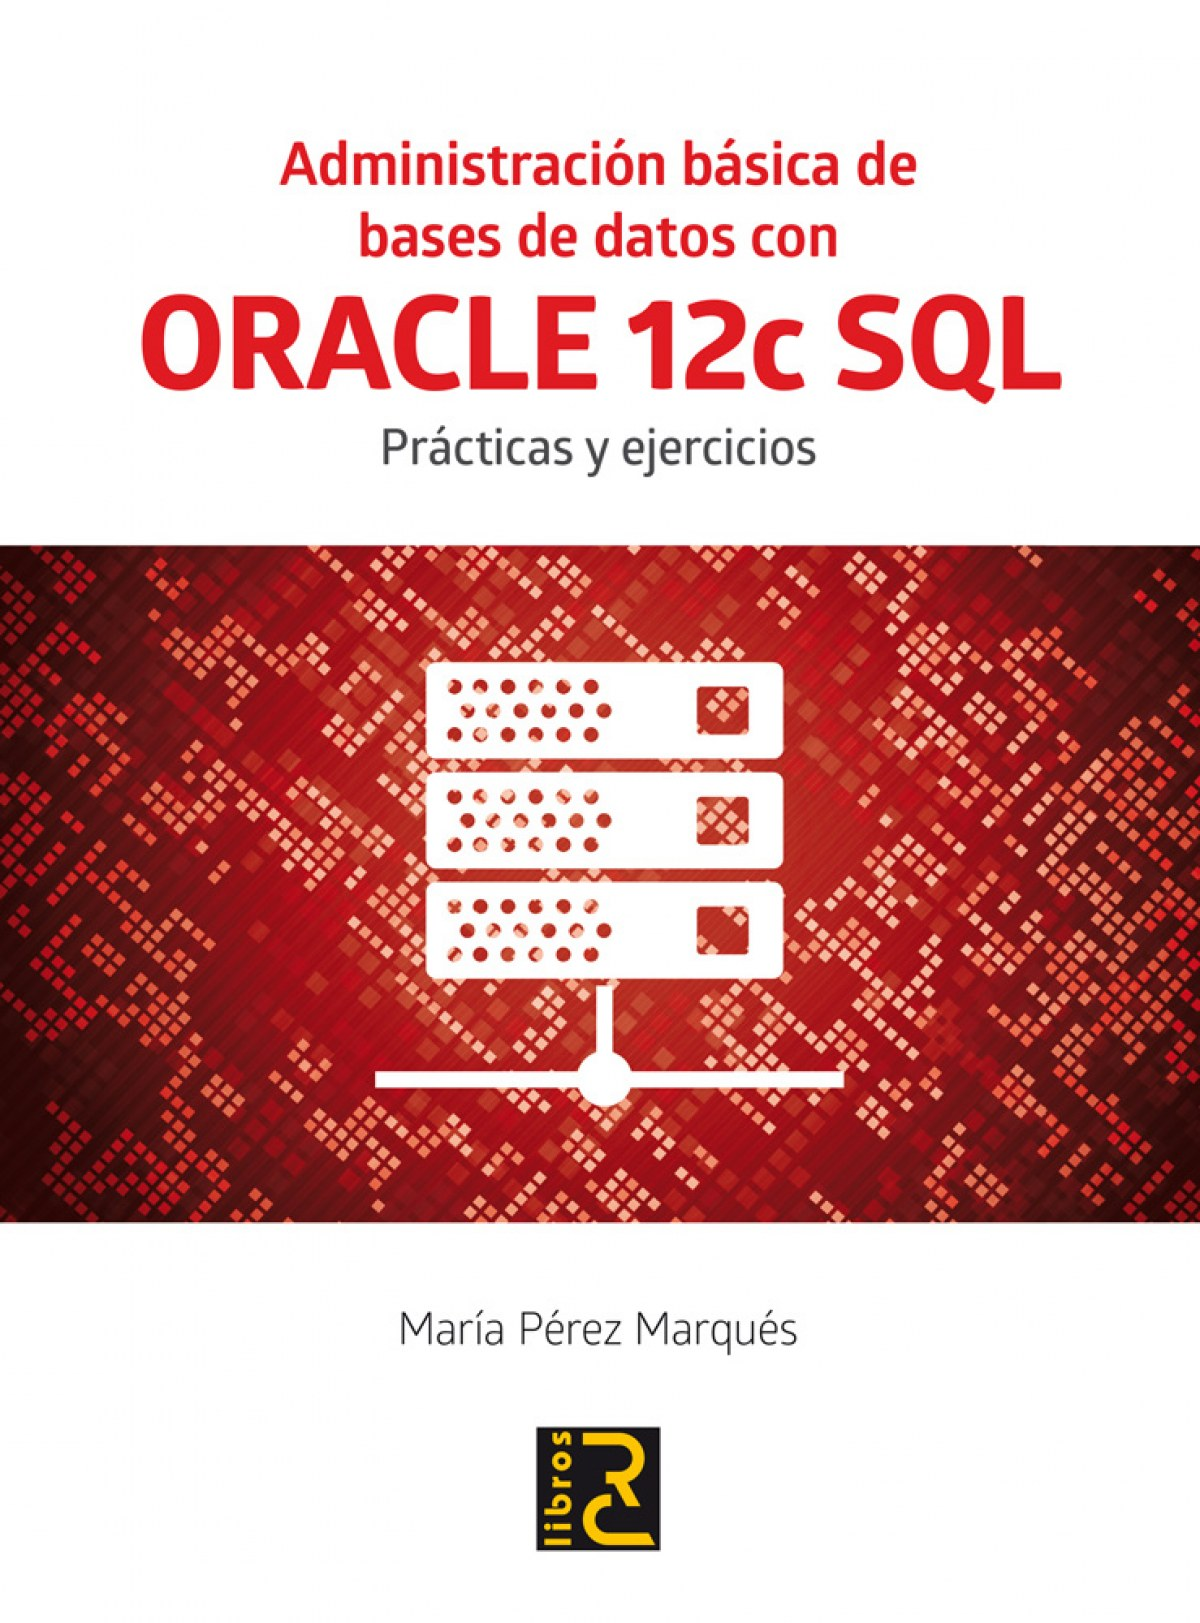 Administracion basica bases datos oracle 12c sql 9788494465017